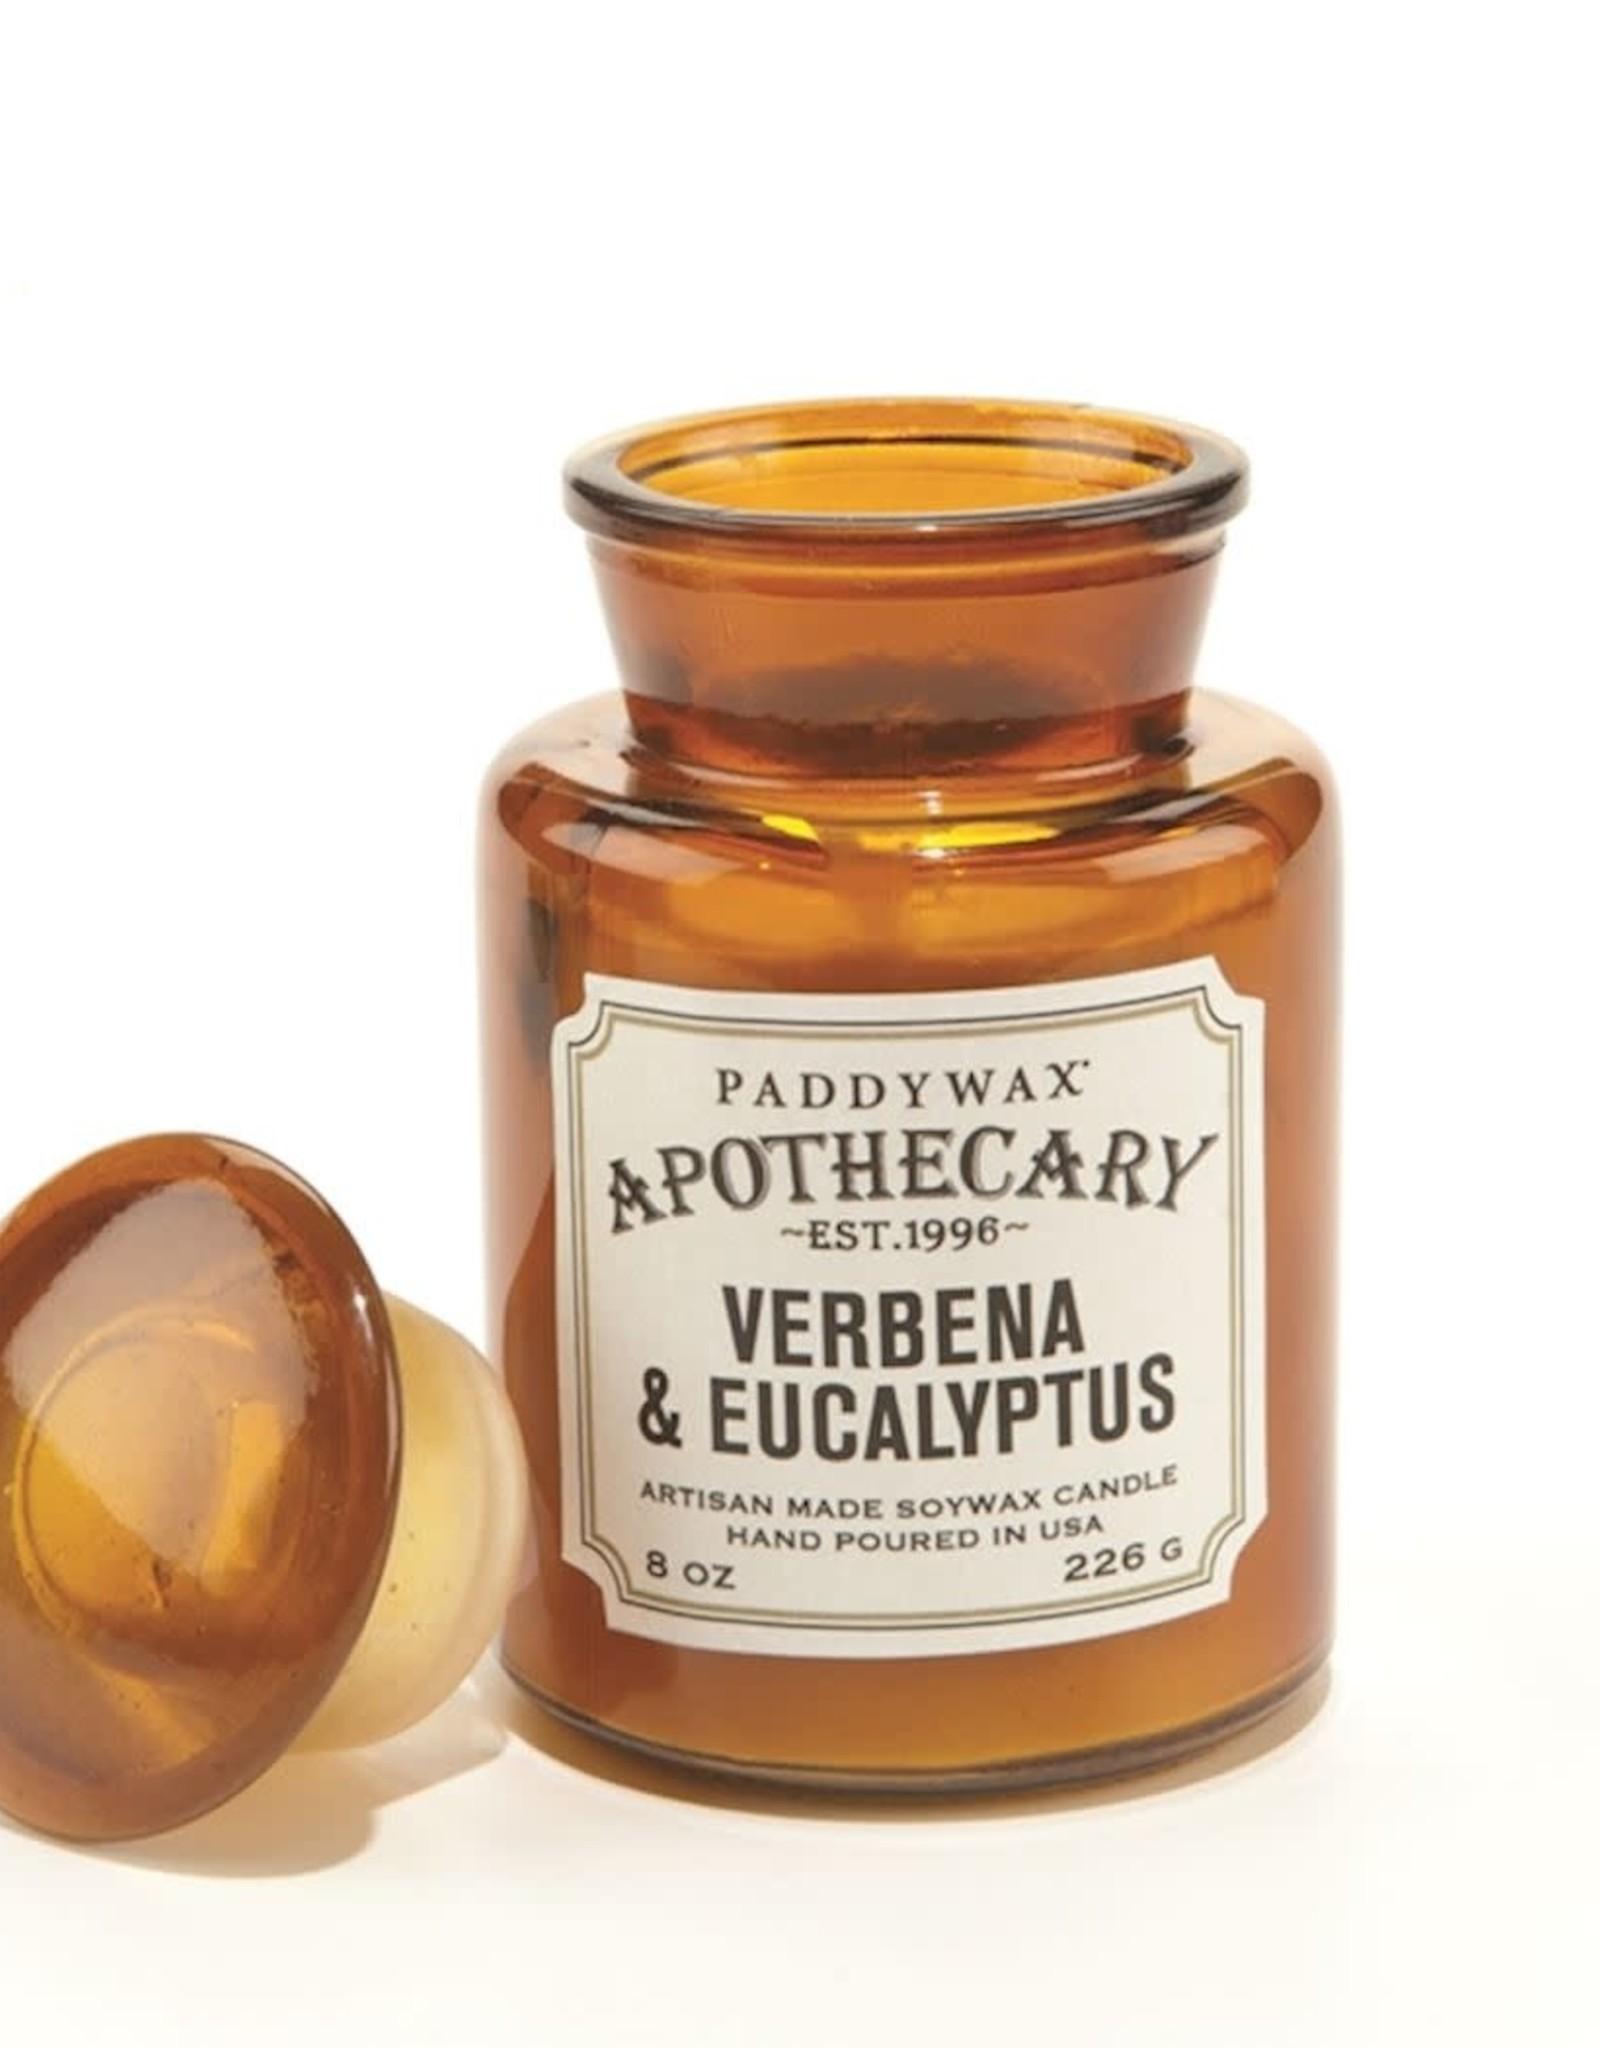 Paddywax Geurkaars sojawas - Verbena & Eucalyptus 226g